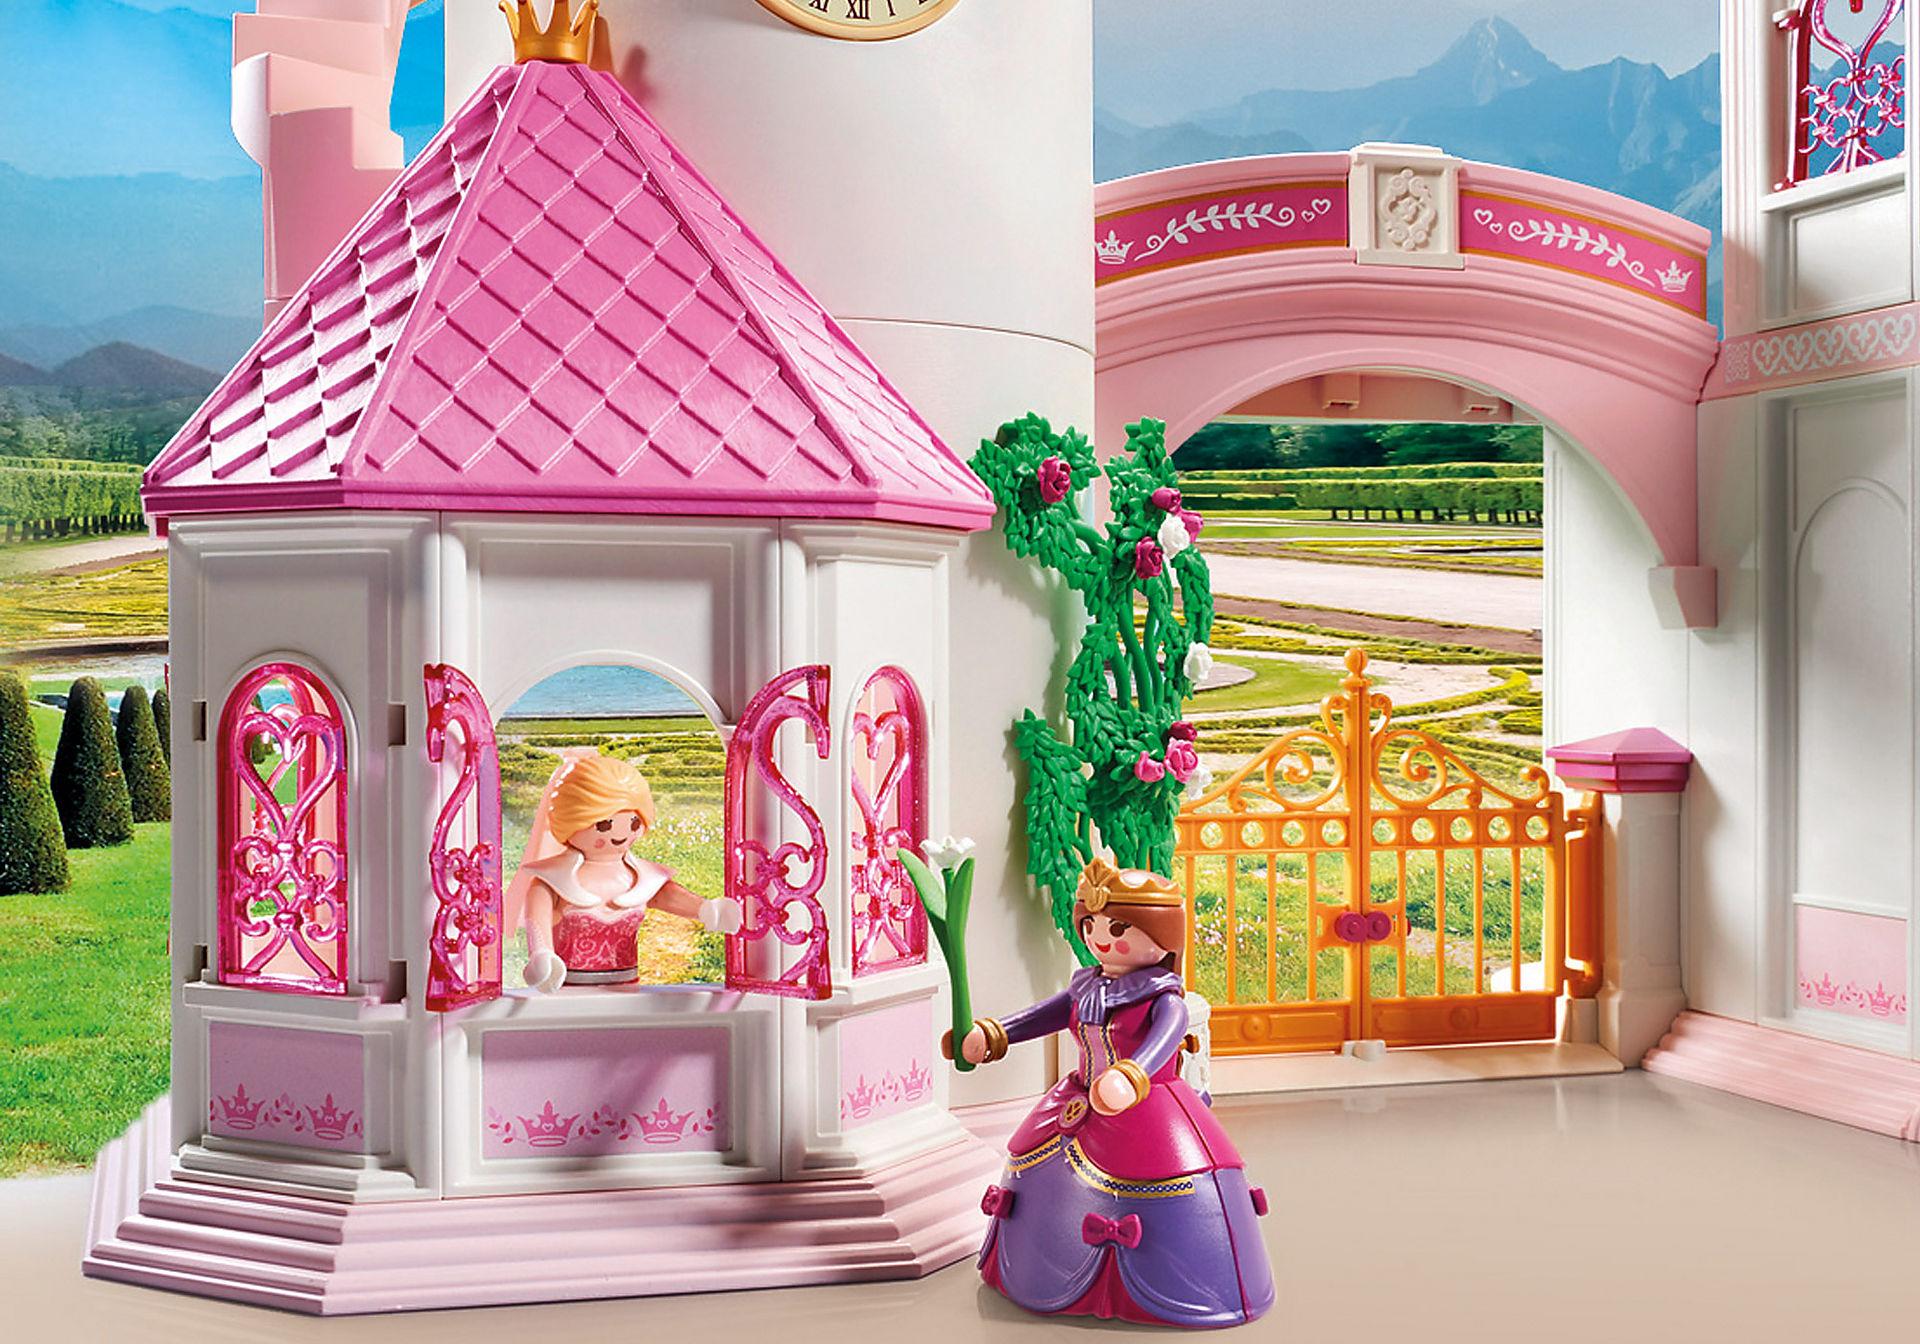 70447 Großes Prinzessinnenschloss zoom image5